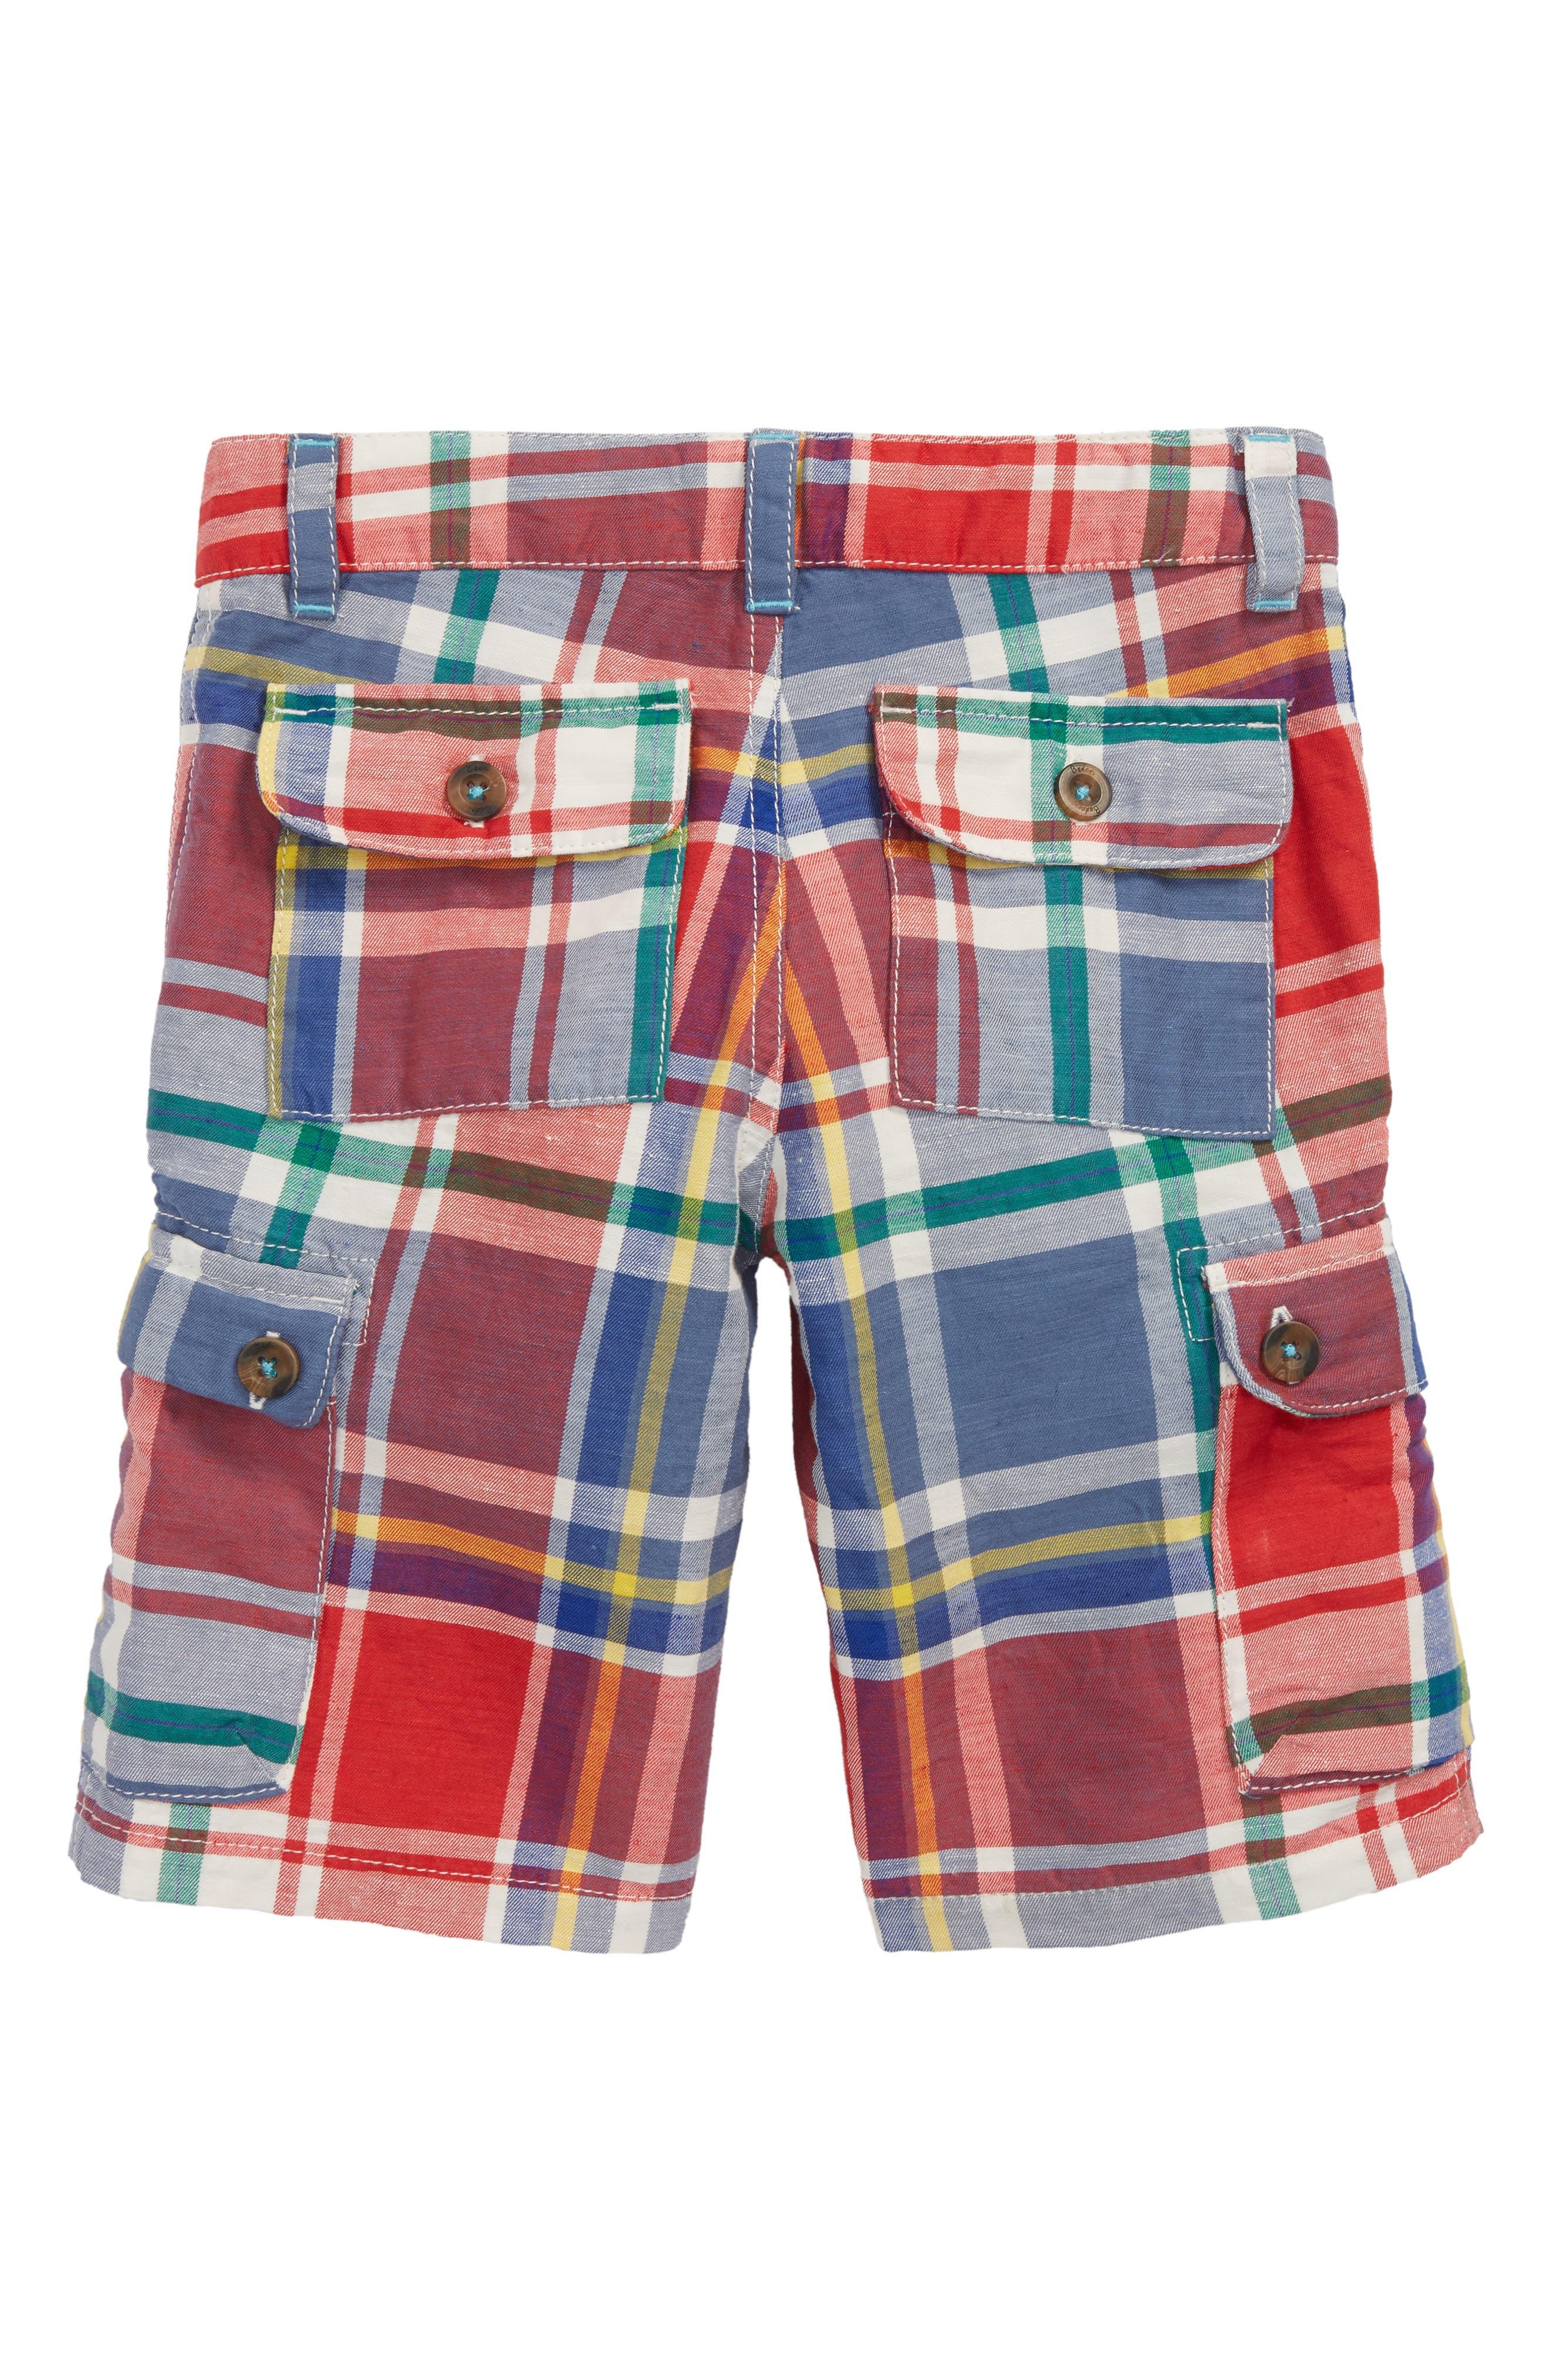 Plaid Cargo Shorts,                             Alternate thumbnail 2, color,                             Washed Crimson Red/ Blue